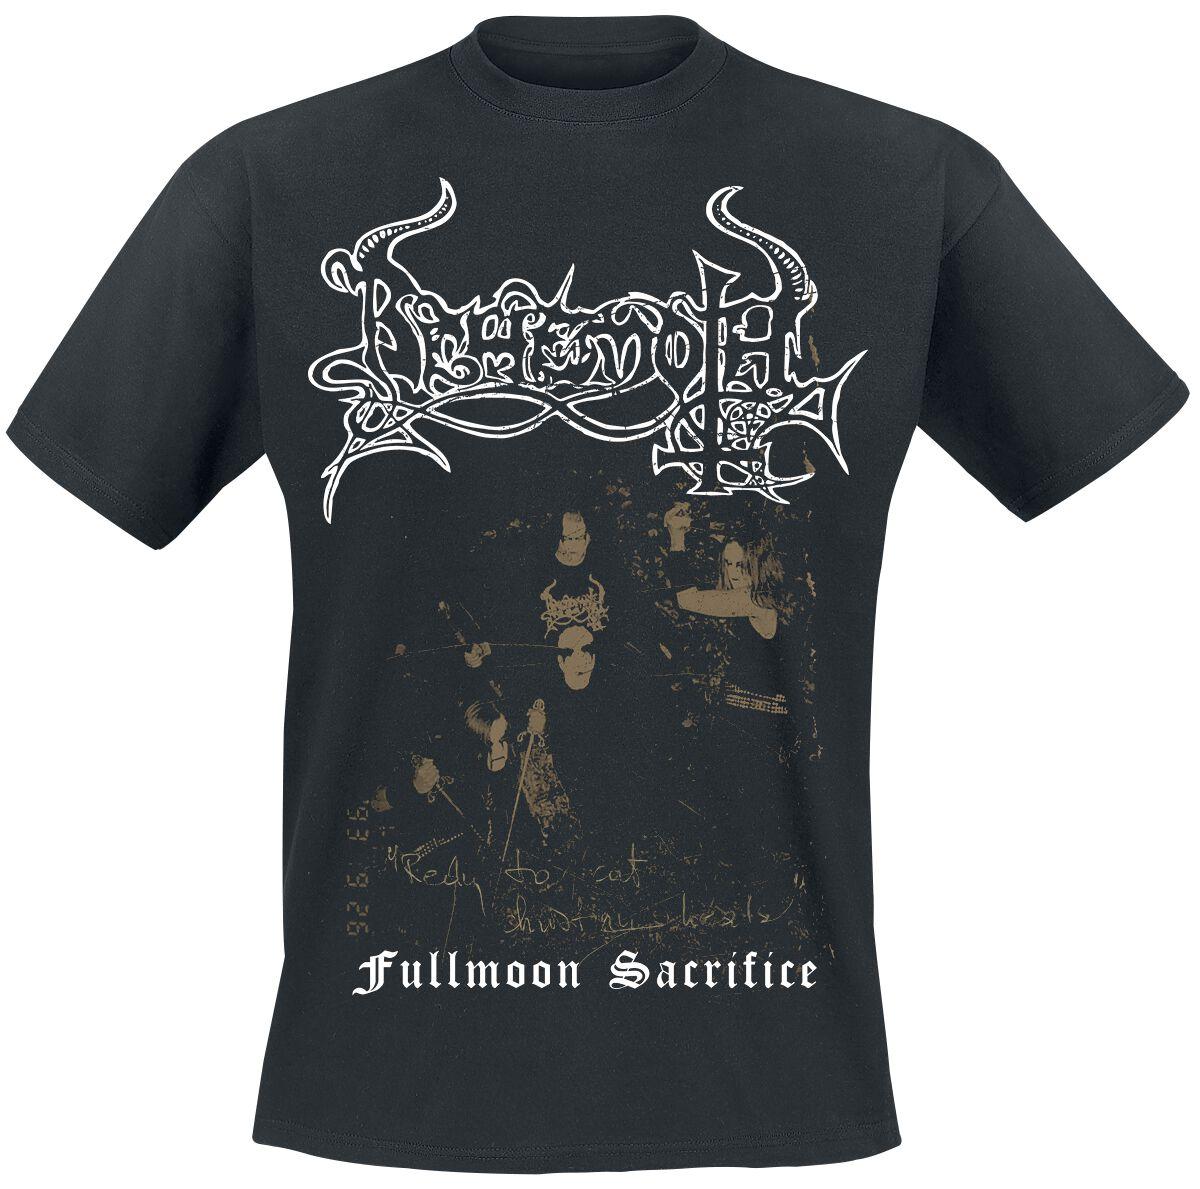 Image of Behemoth Fullmoon Sacrifice T-Shirt schwarz